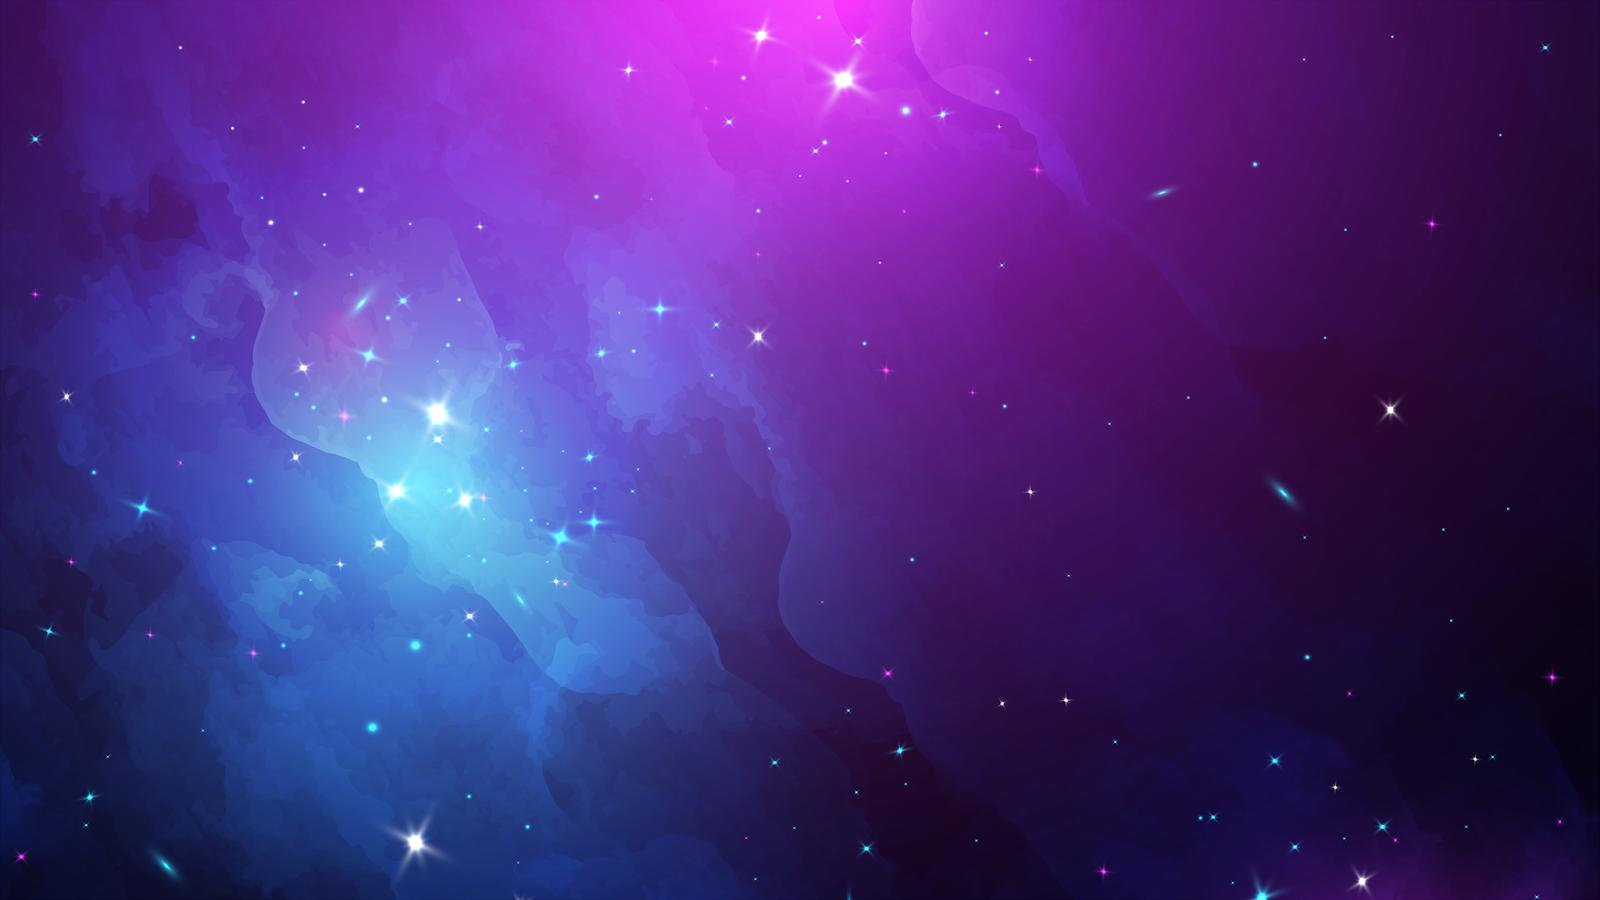 Galaxy in 4K background wallpaper